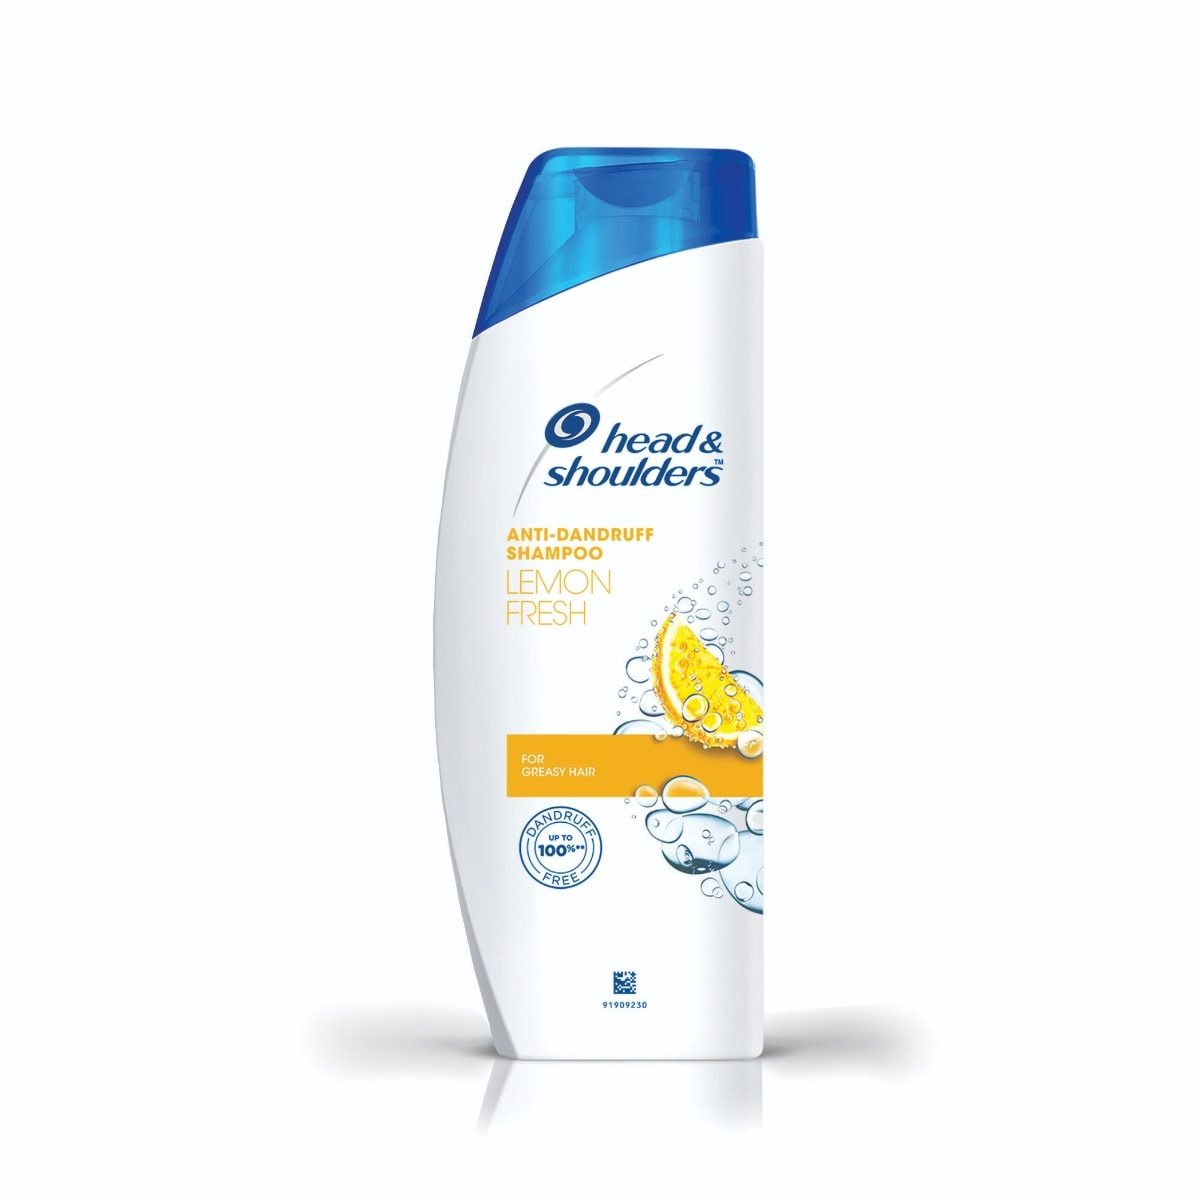 Head & Shoulders Anti-Dandruff Lemon Fresh Shampoo, 180 ml, Pack of 1